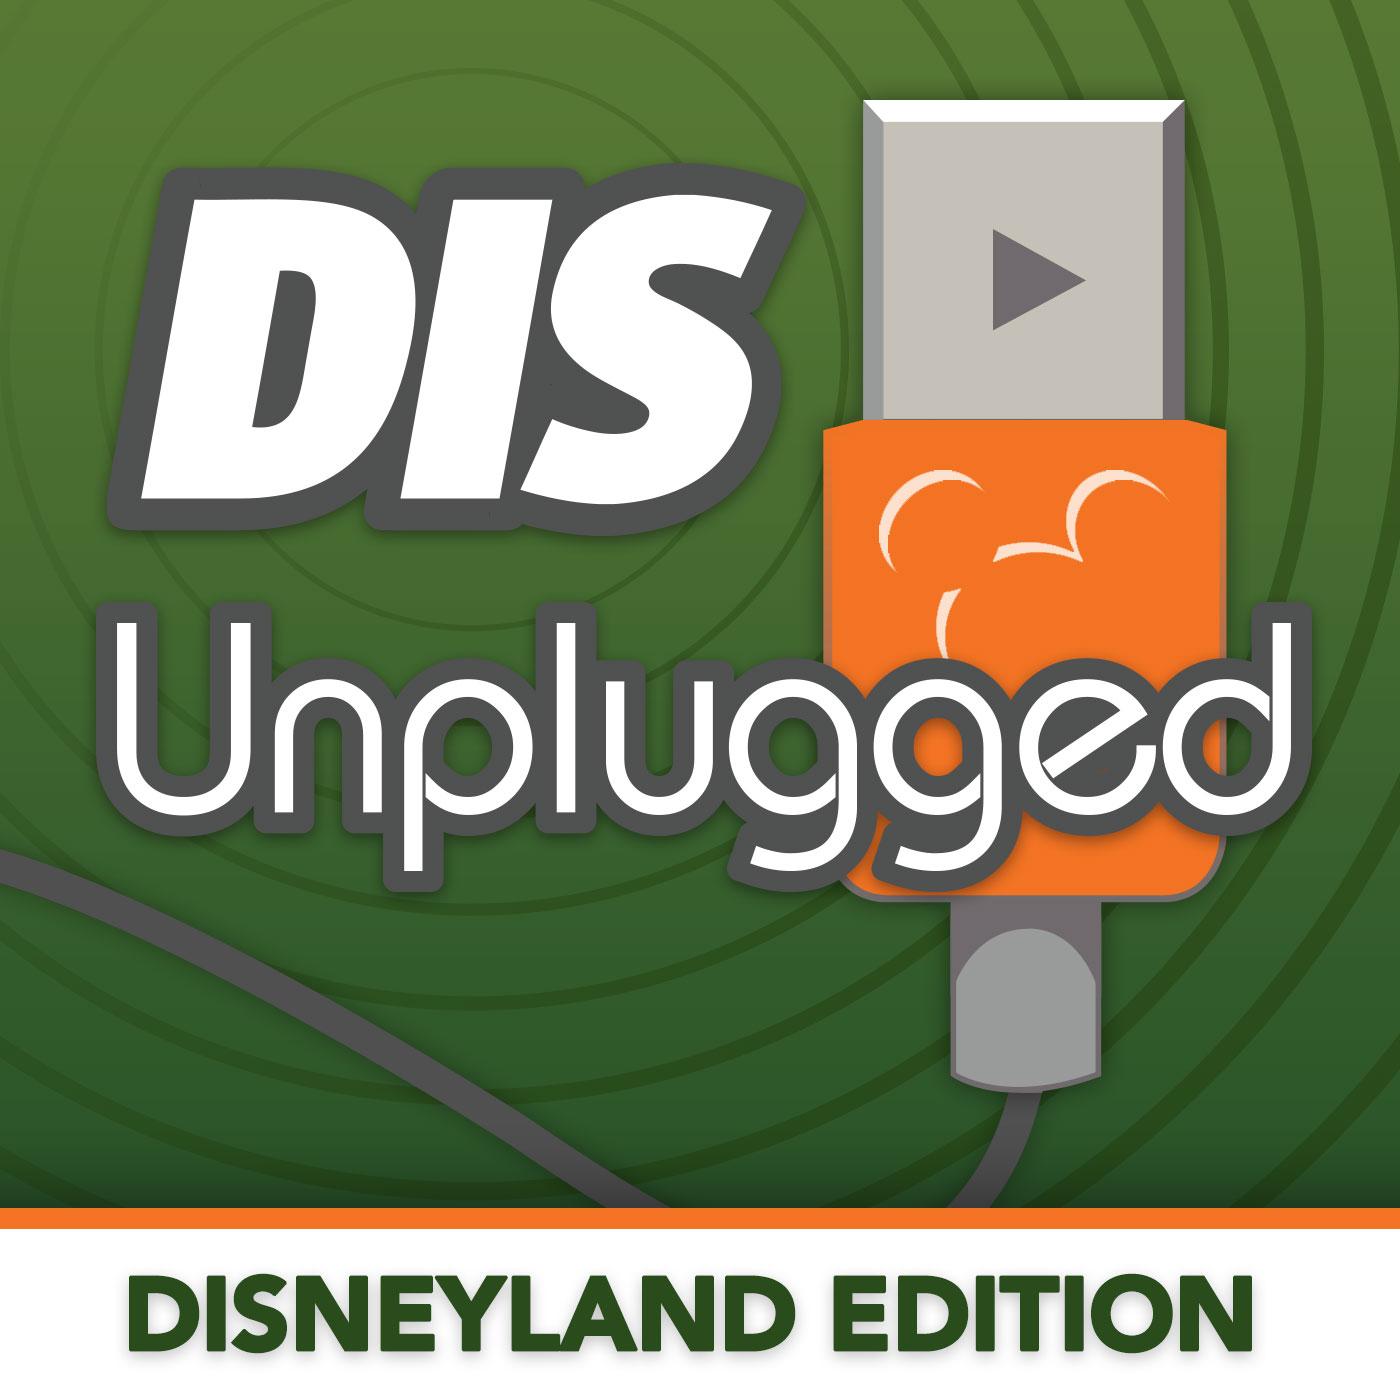 DIS Unplugged: Disneyland Edition